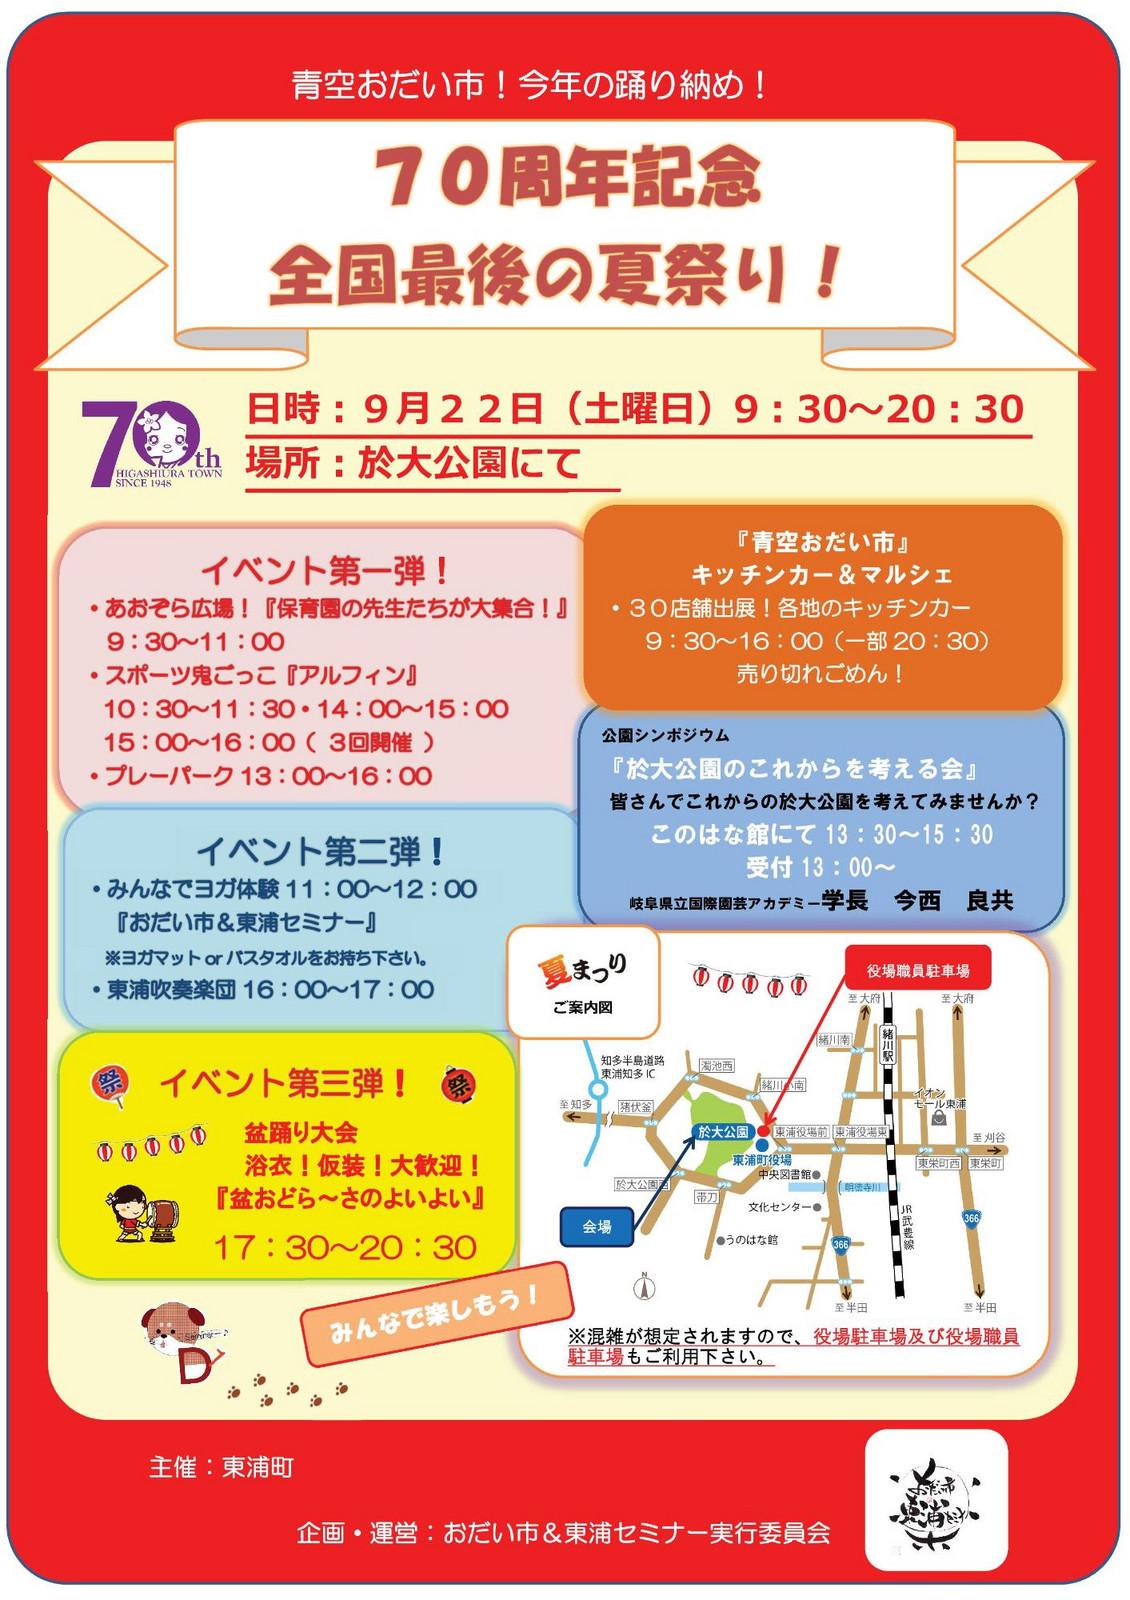 Odaiparkaozoraichi20180922_2